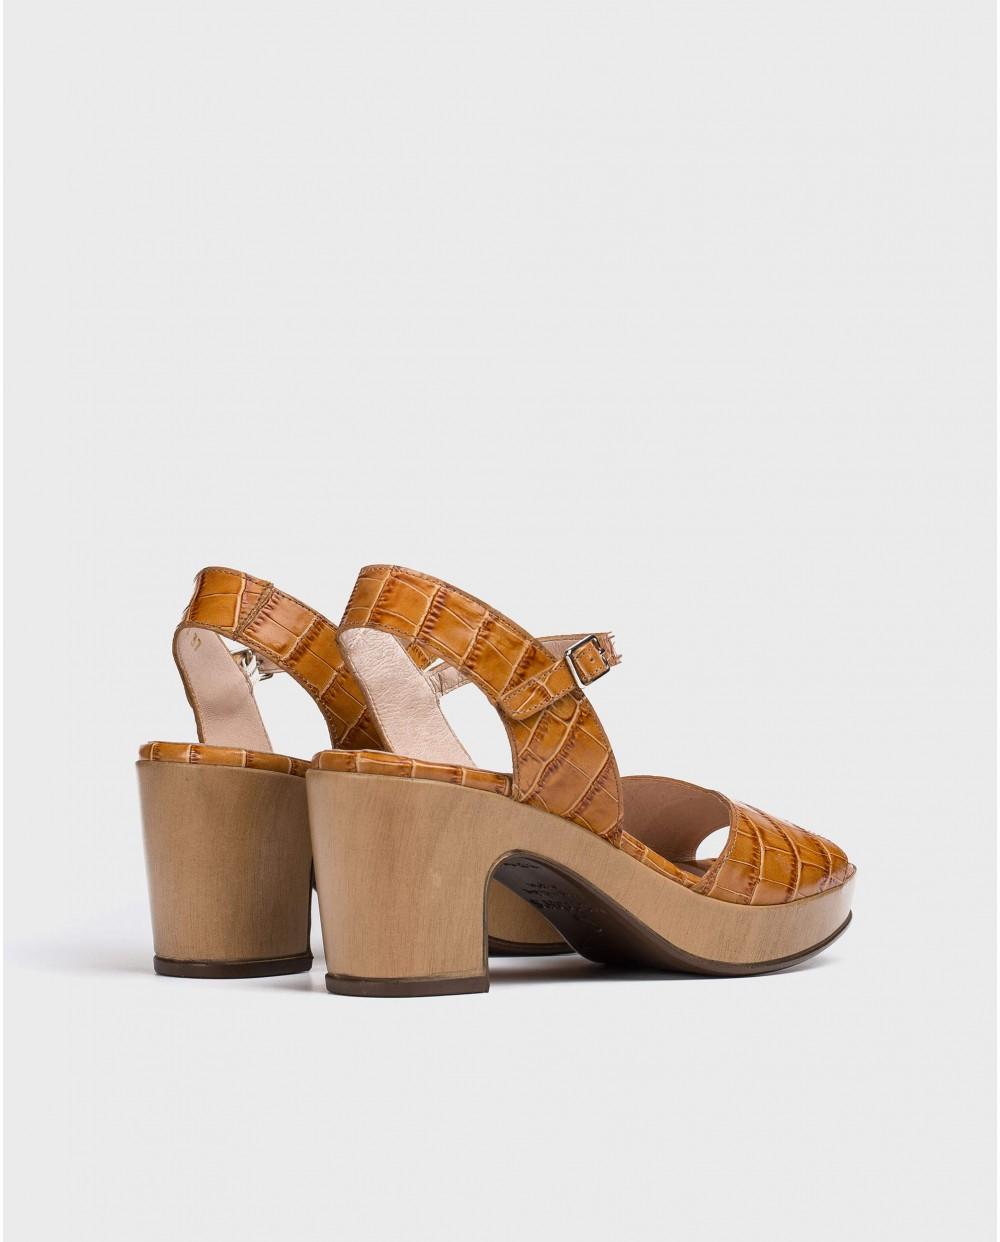 Wonders-Heels-Platform sandal with irregular strap